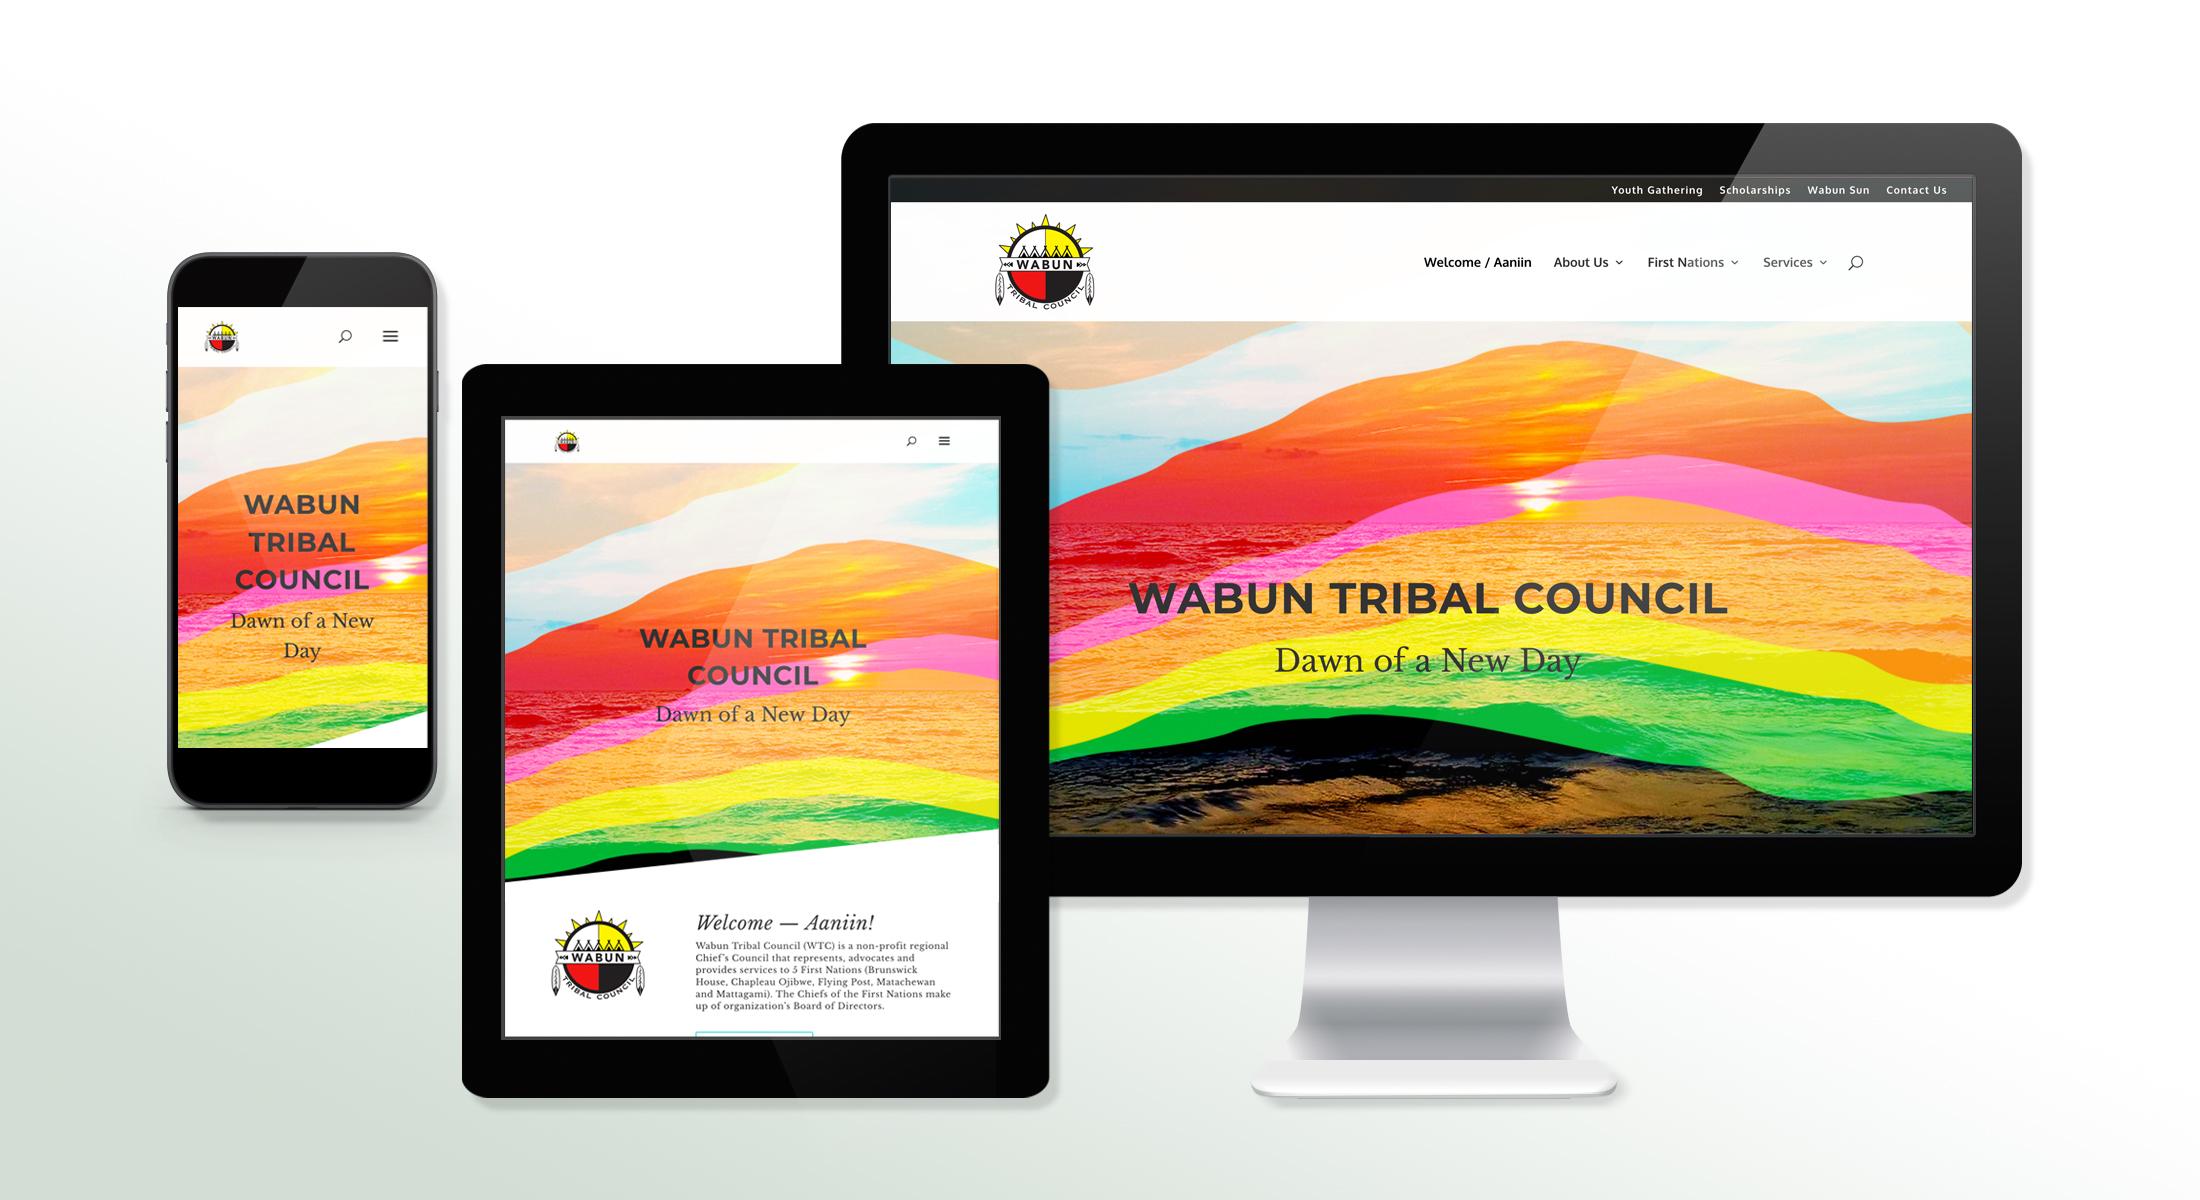 Wabun Tribal Council Website